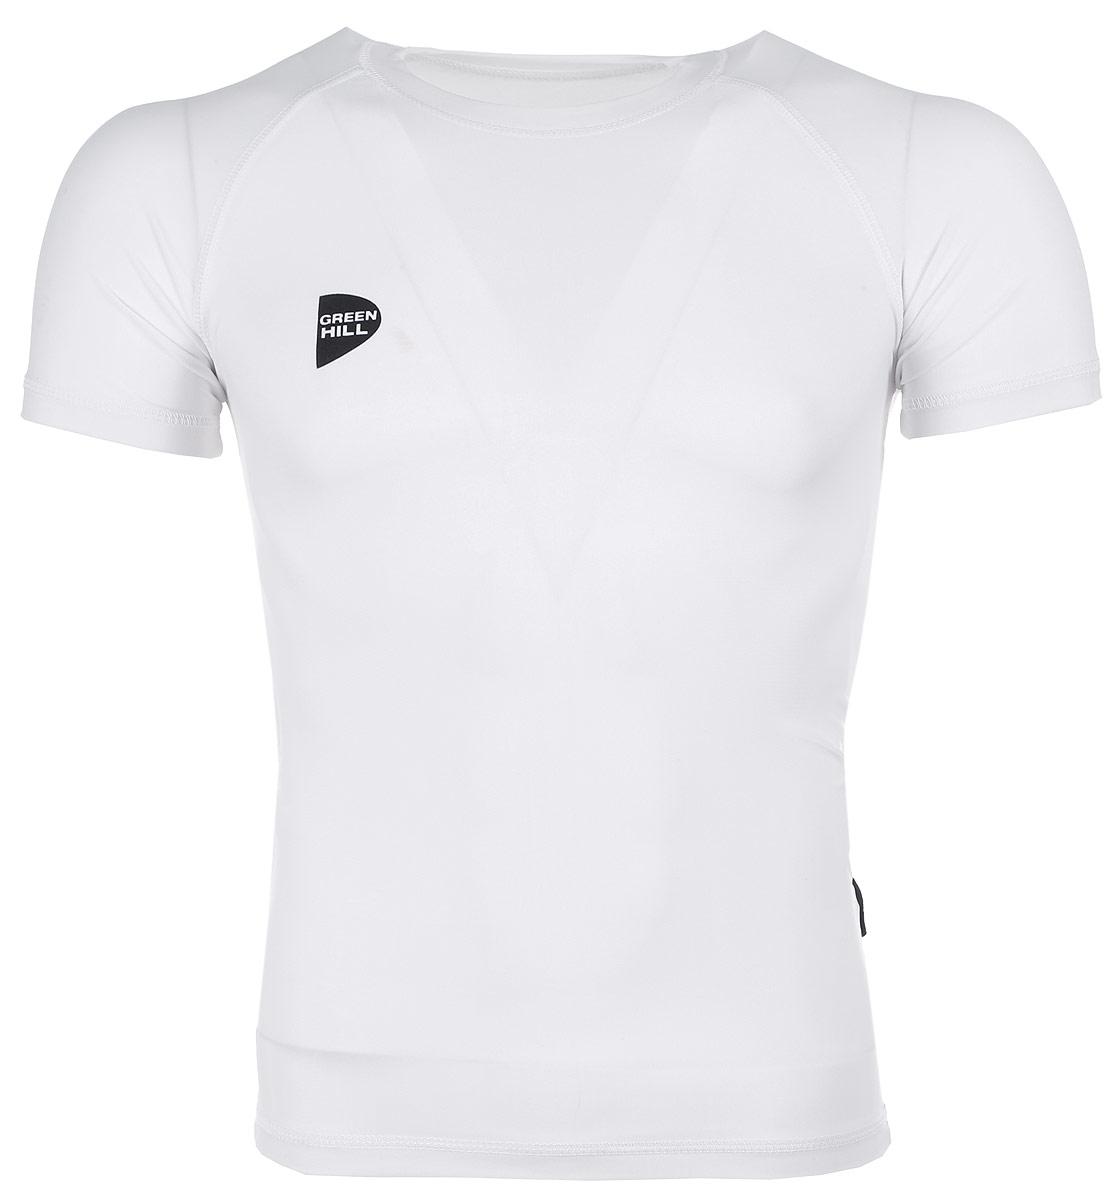 Защитная футболка Green Hill, цвет: белый. Размер XXL. RGS-3558RGS-3558Защитная футболка с логотипом дзюдо. Материал: полиэстер/лайкра. Размеры: Длина 74 см ширина 47 см